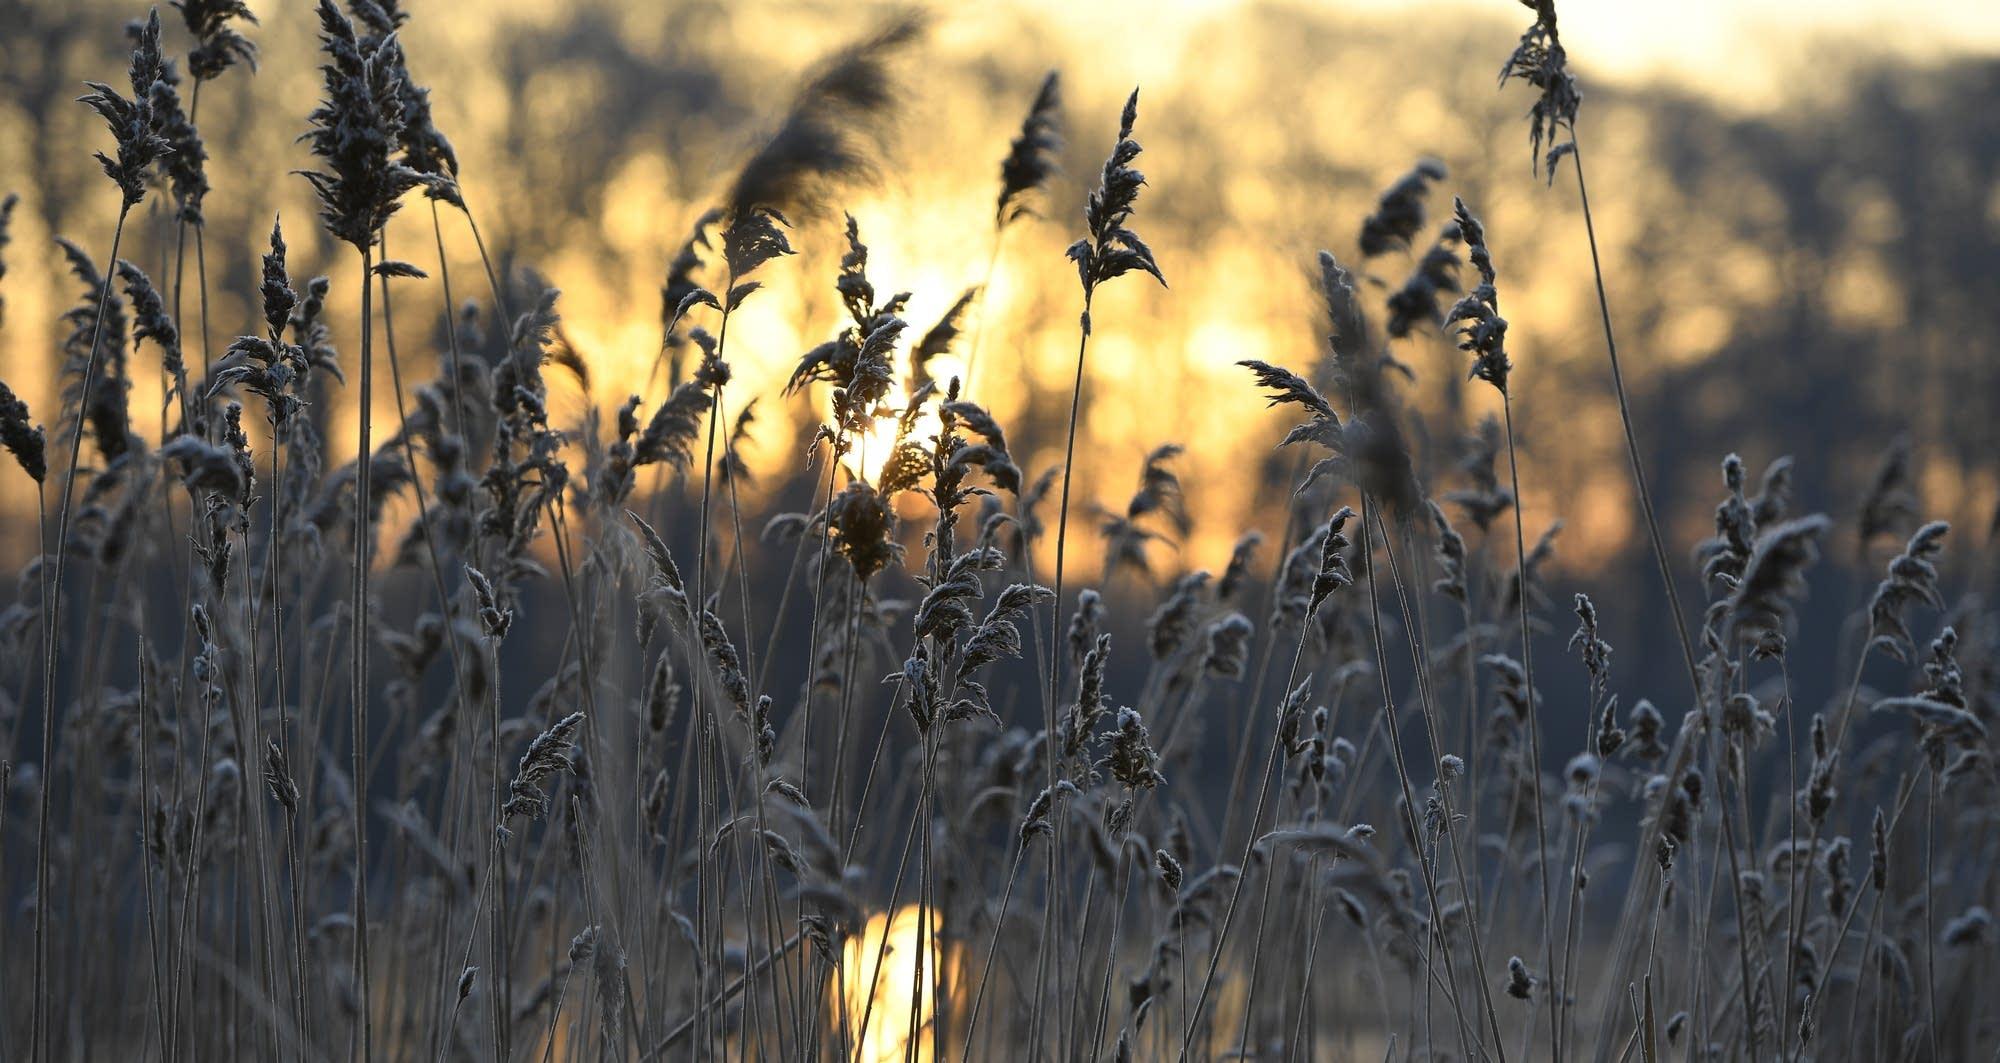 Frost covers common reeds (phragmites australis).